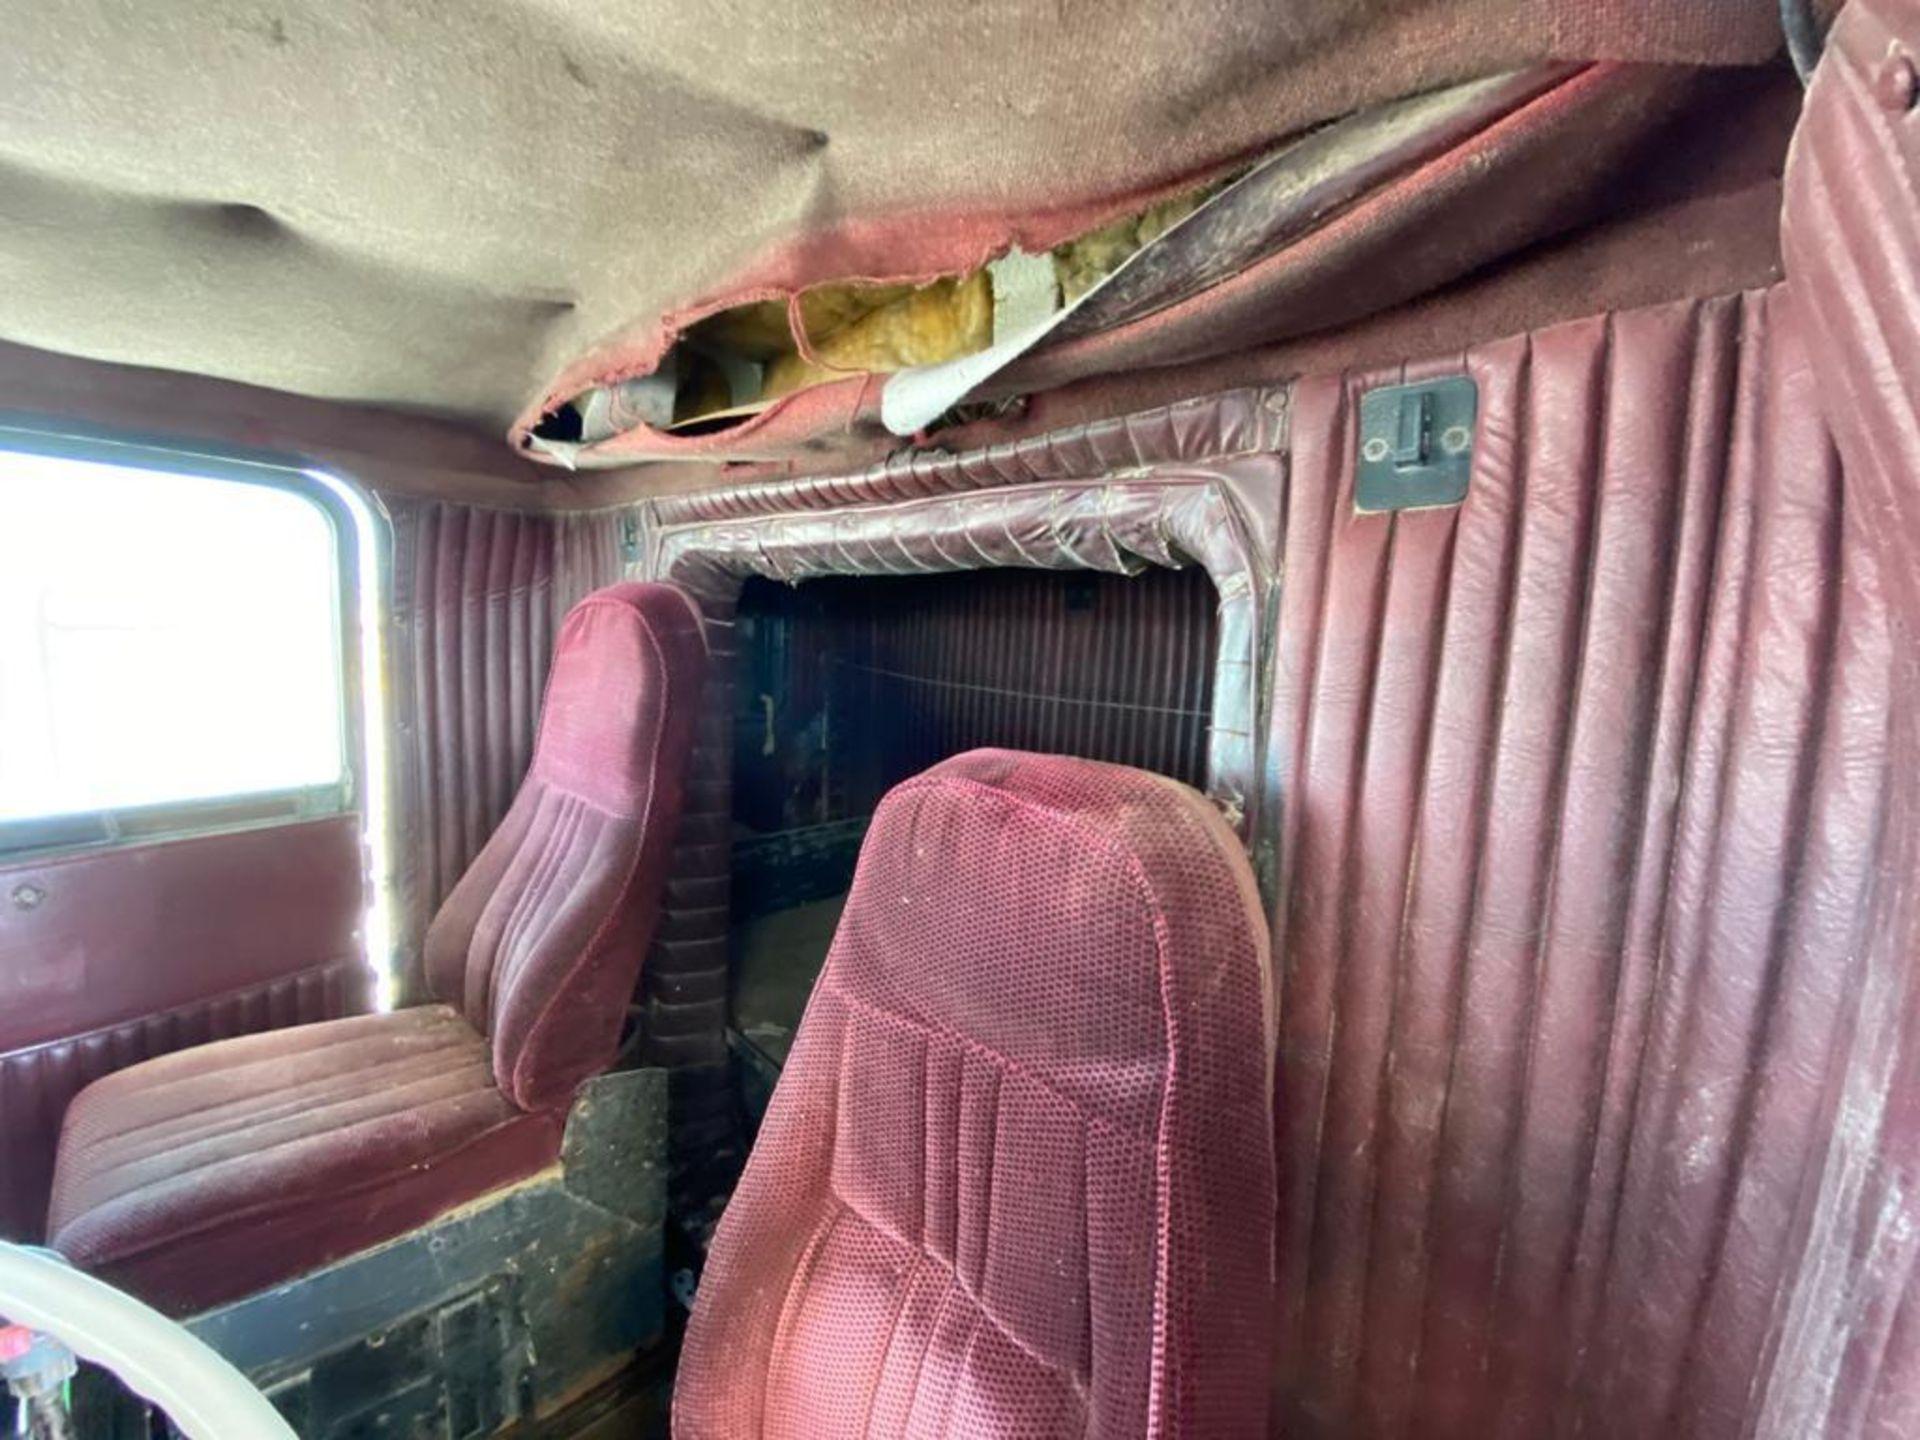 1983 Kenworth Dump Truck, standard transmission of 10 speeds, with Cummins motor - Image 63 of 68